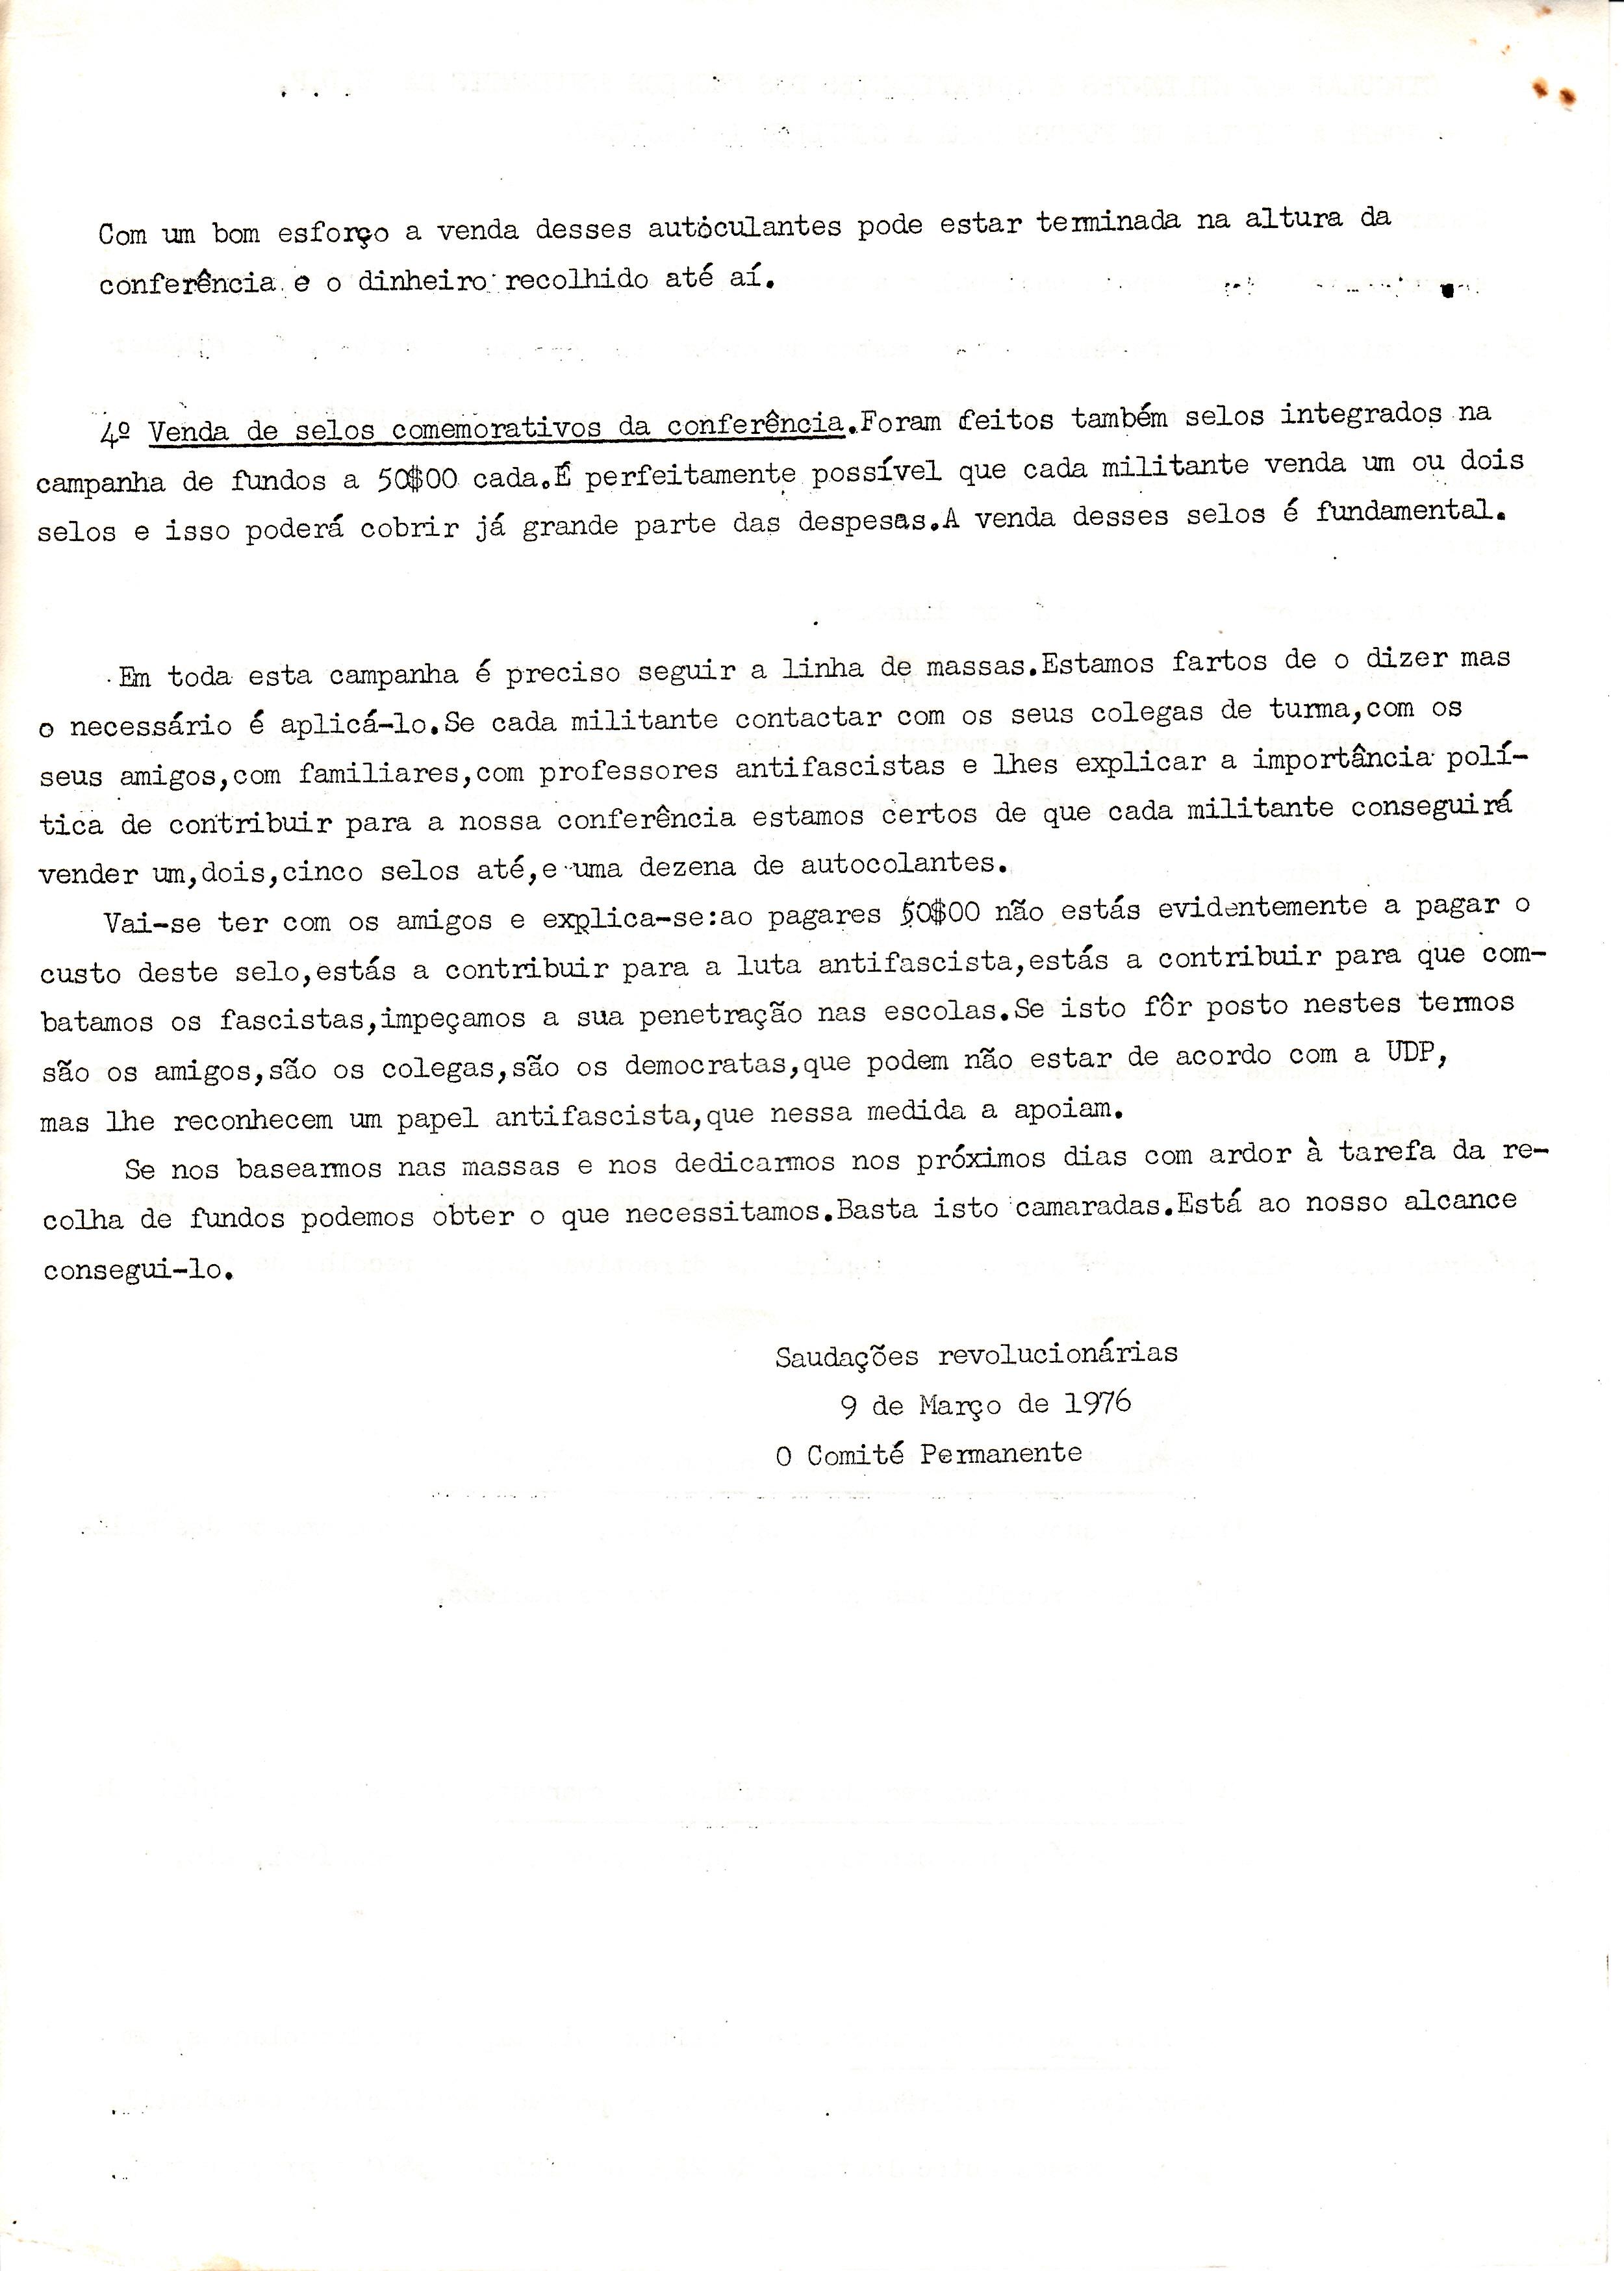 UEDP_1976_03_0002